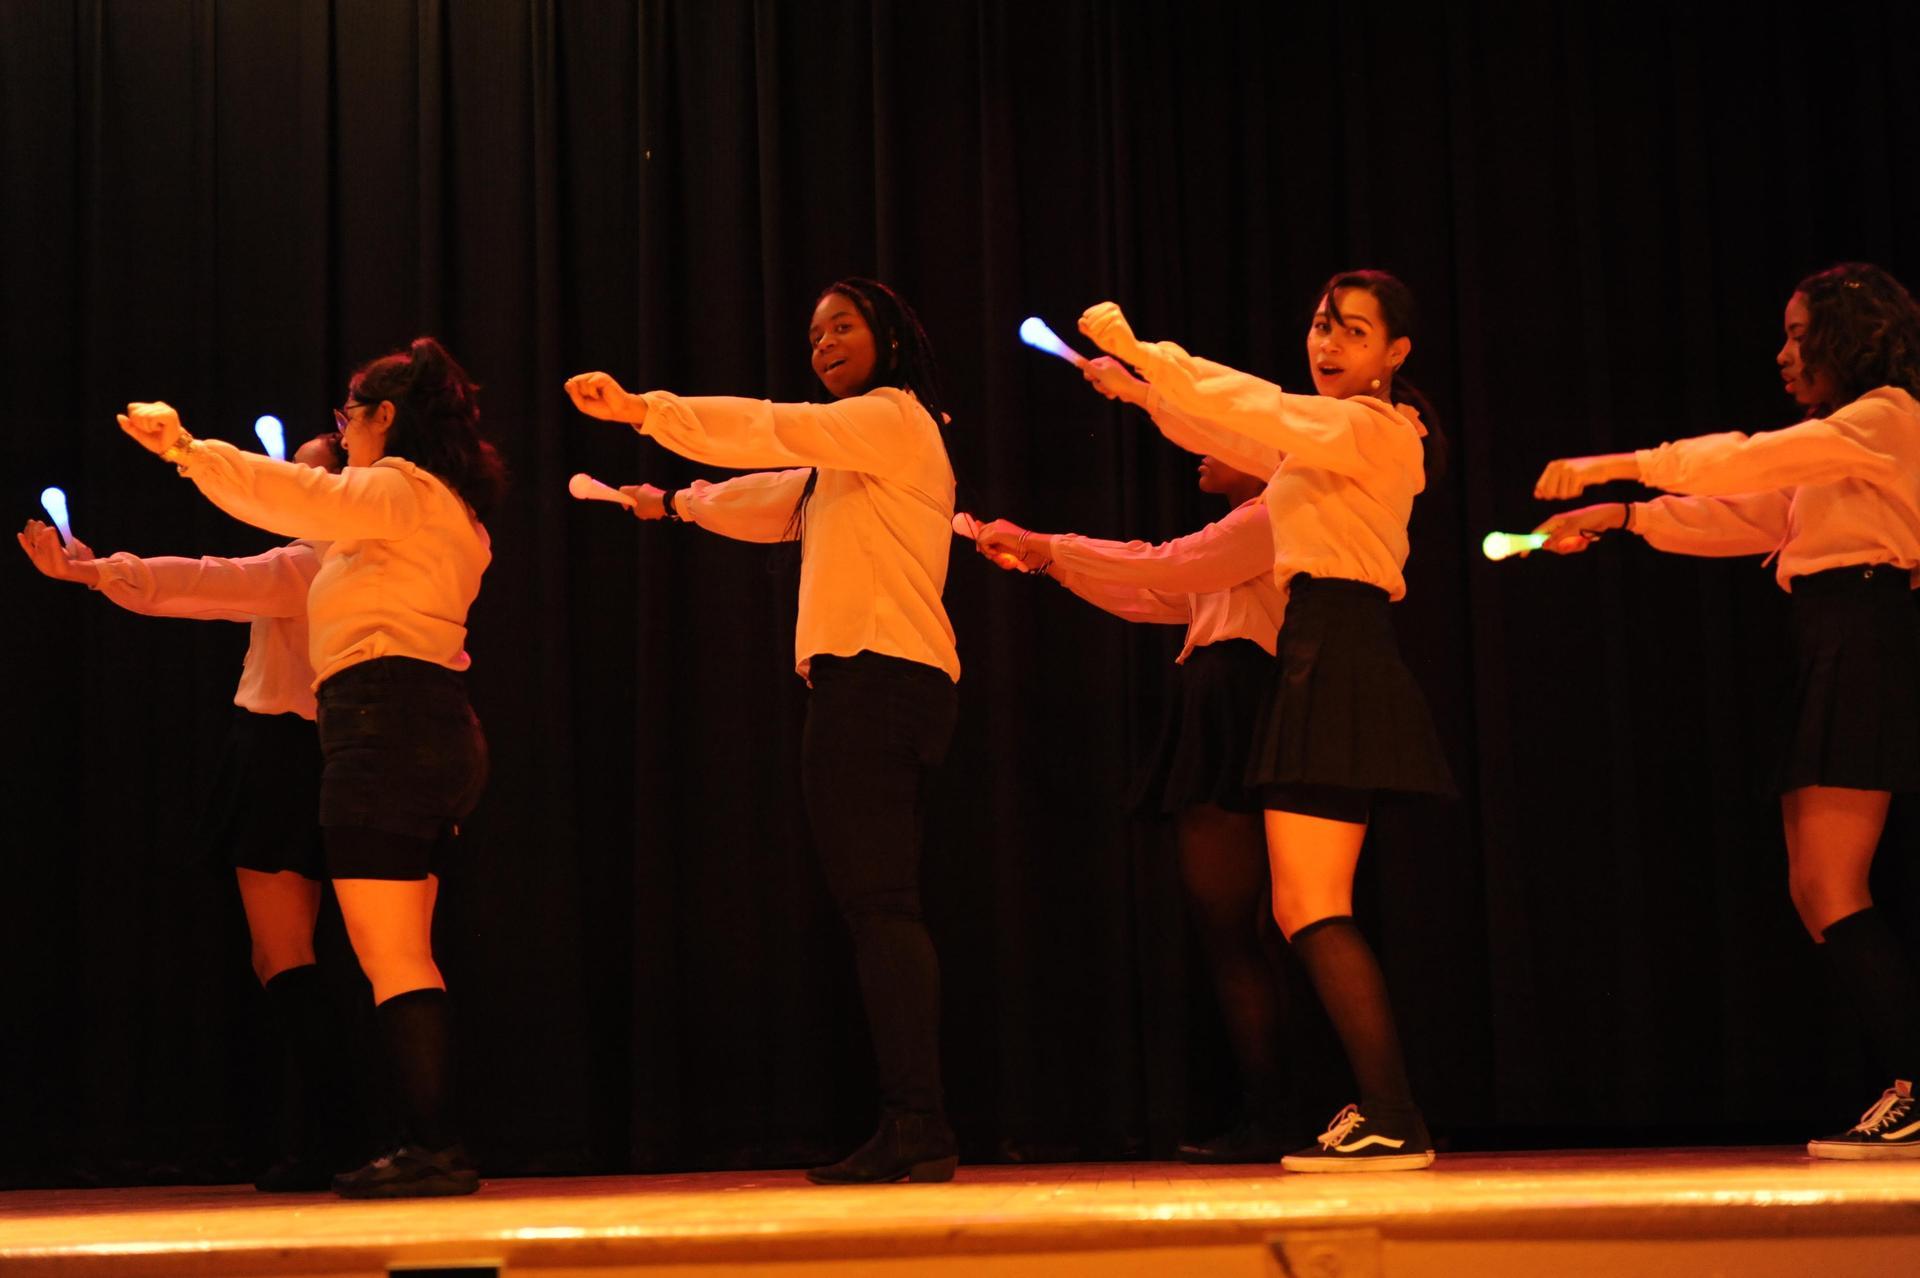 Our KPop Dance Group